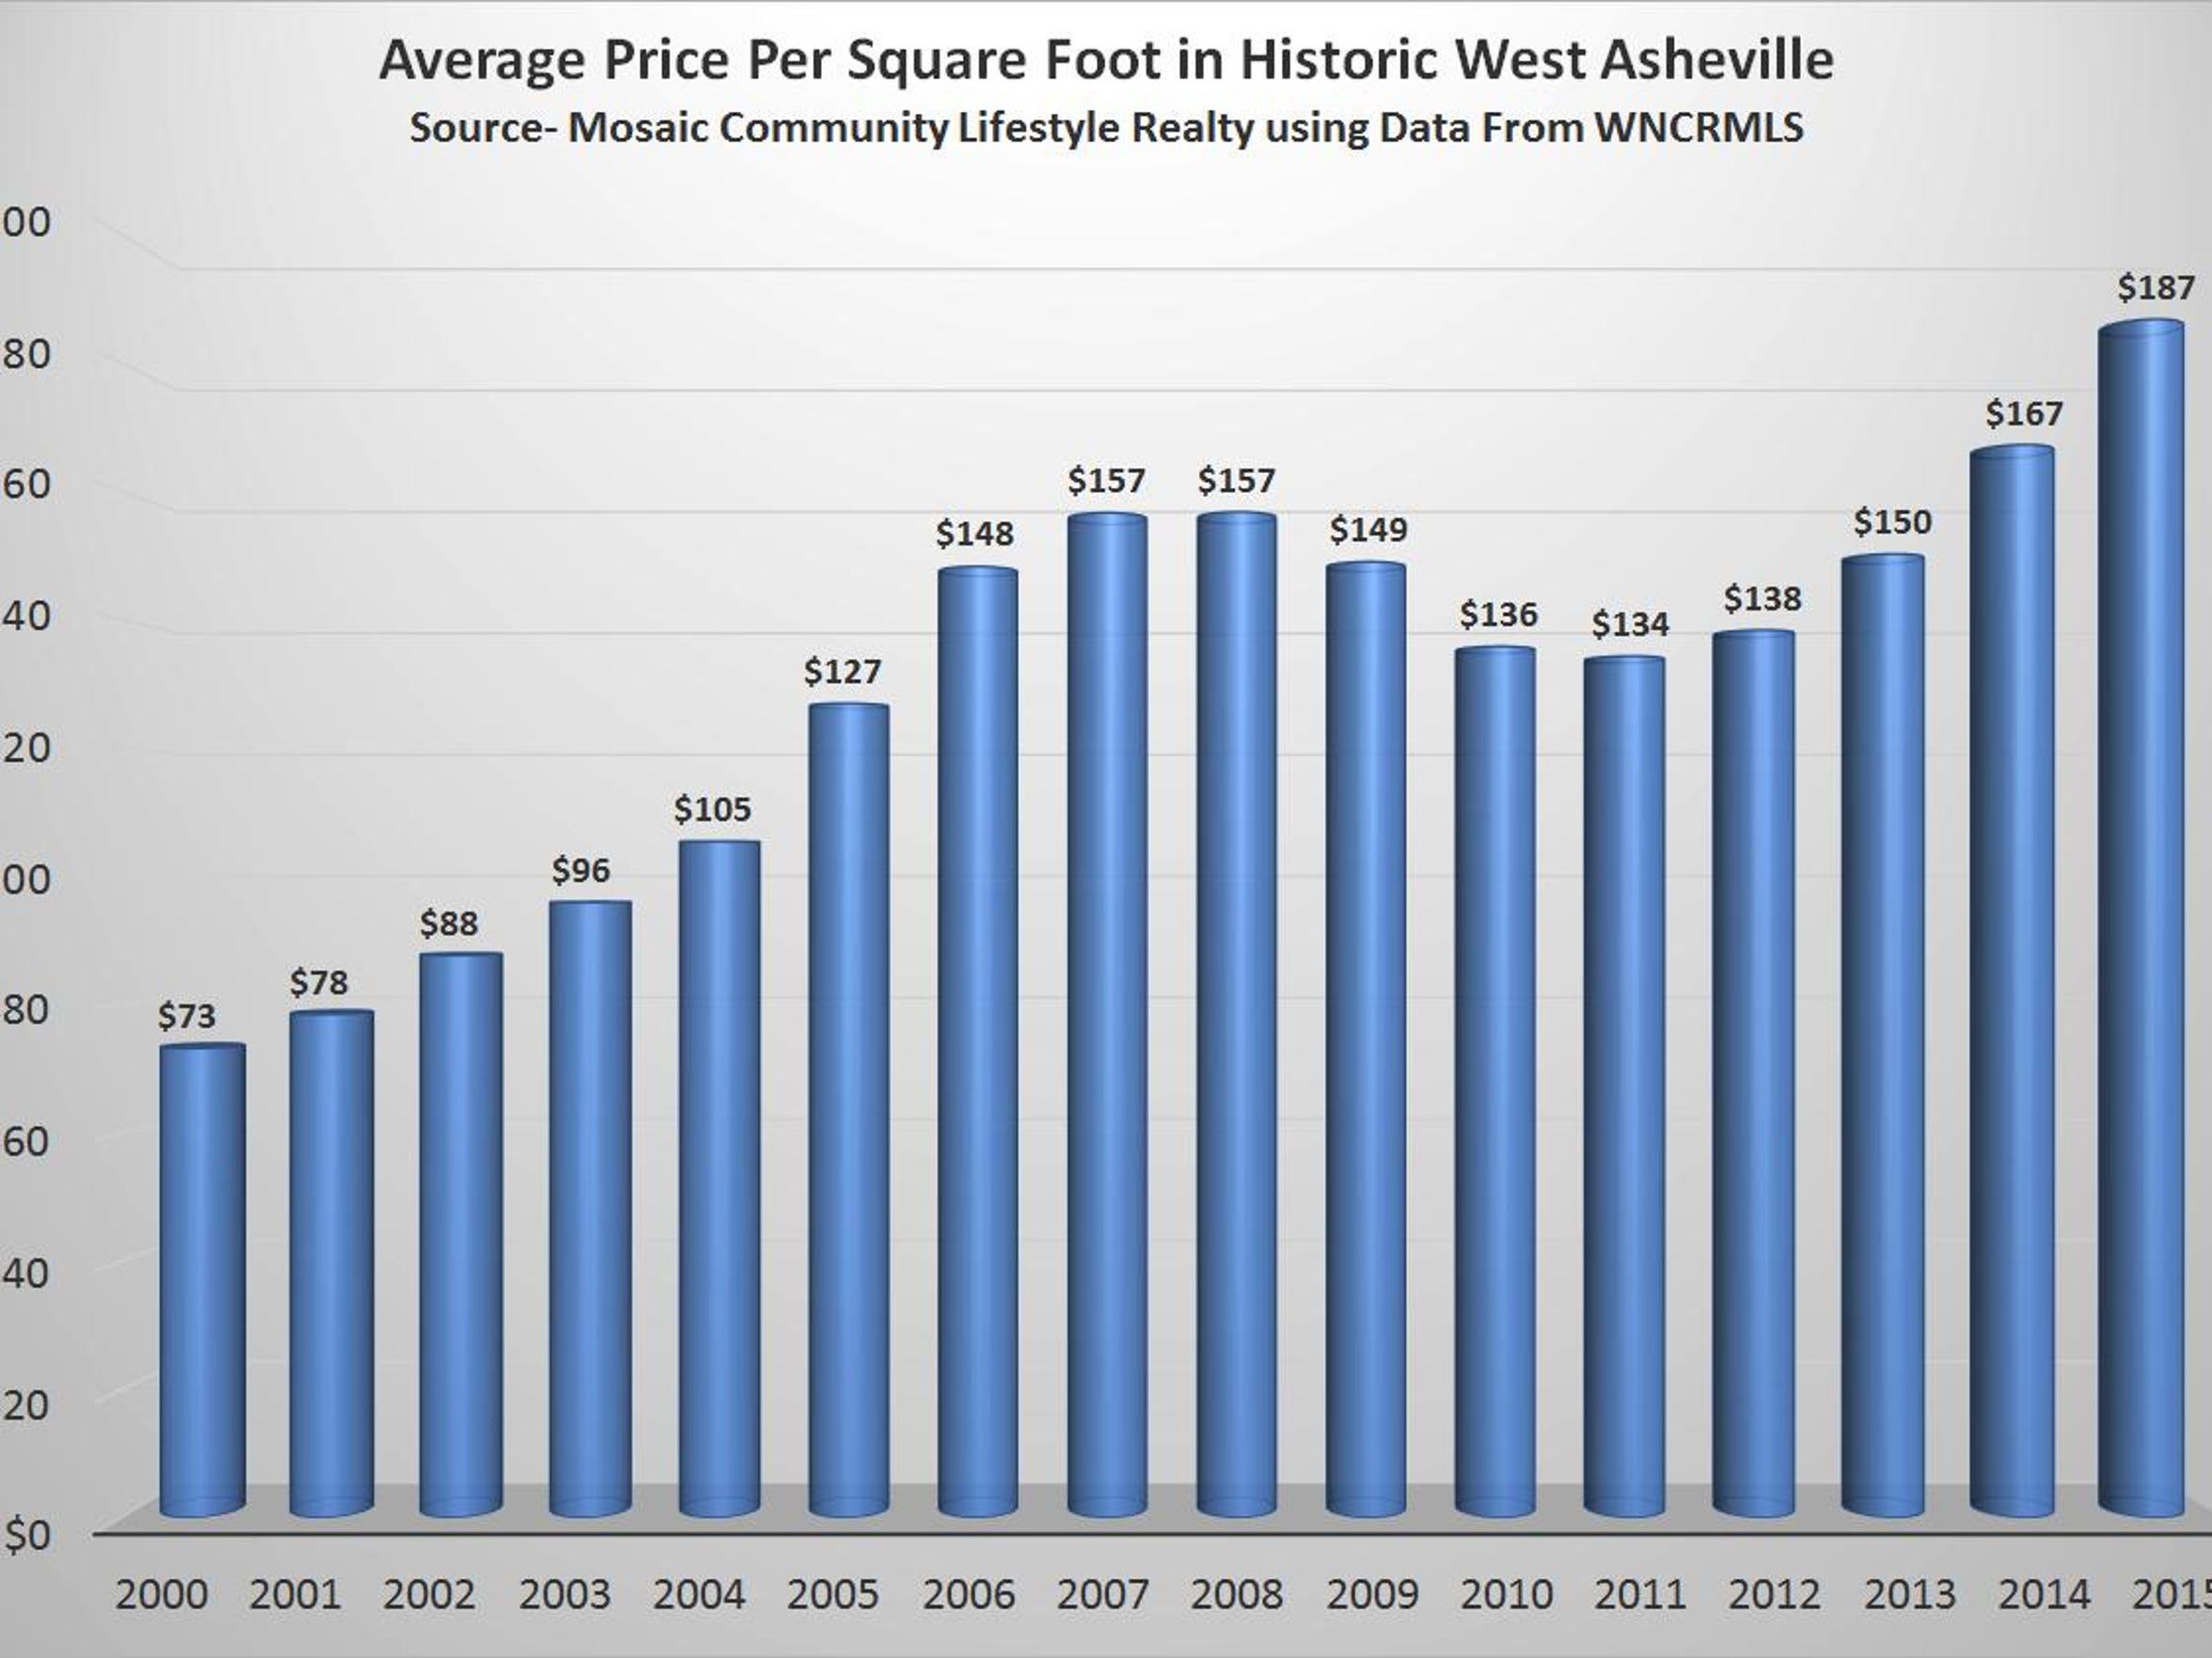 Average Price Per Square Foot in West Asheville